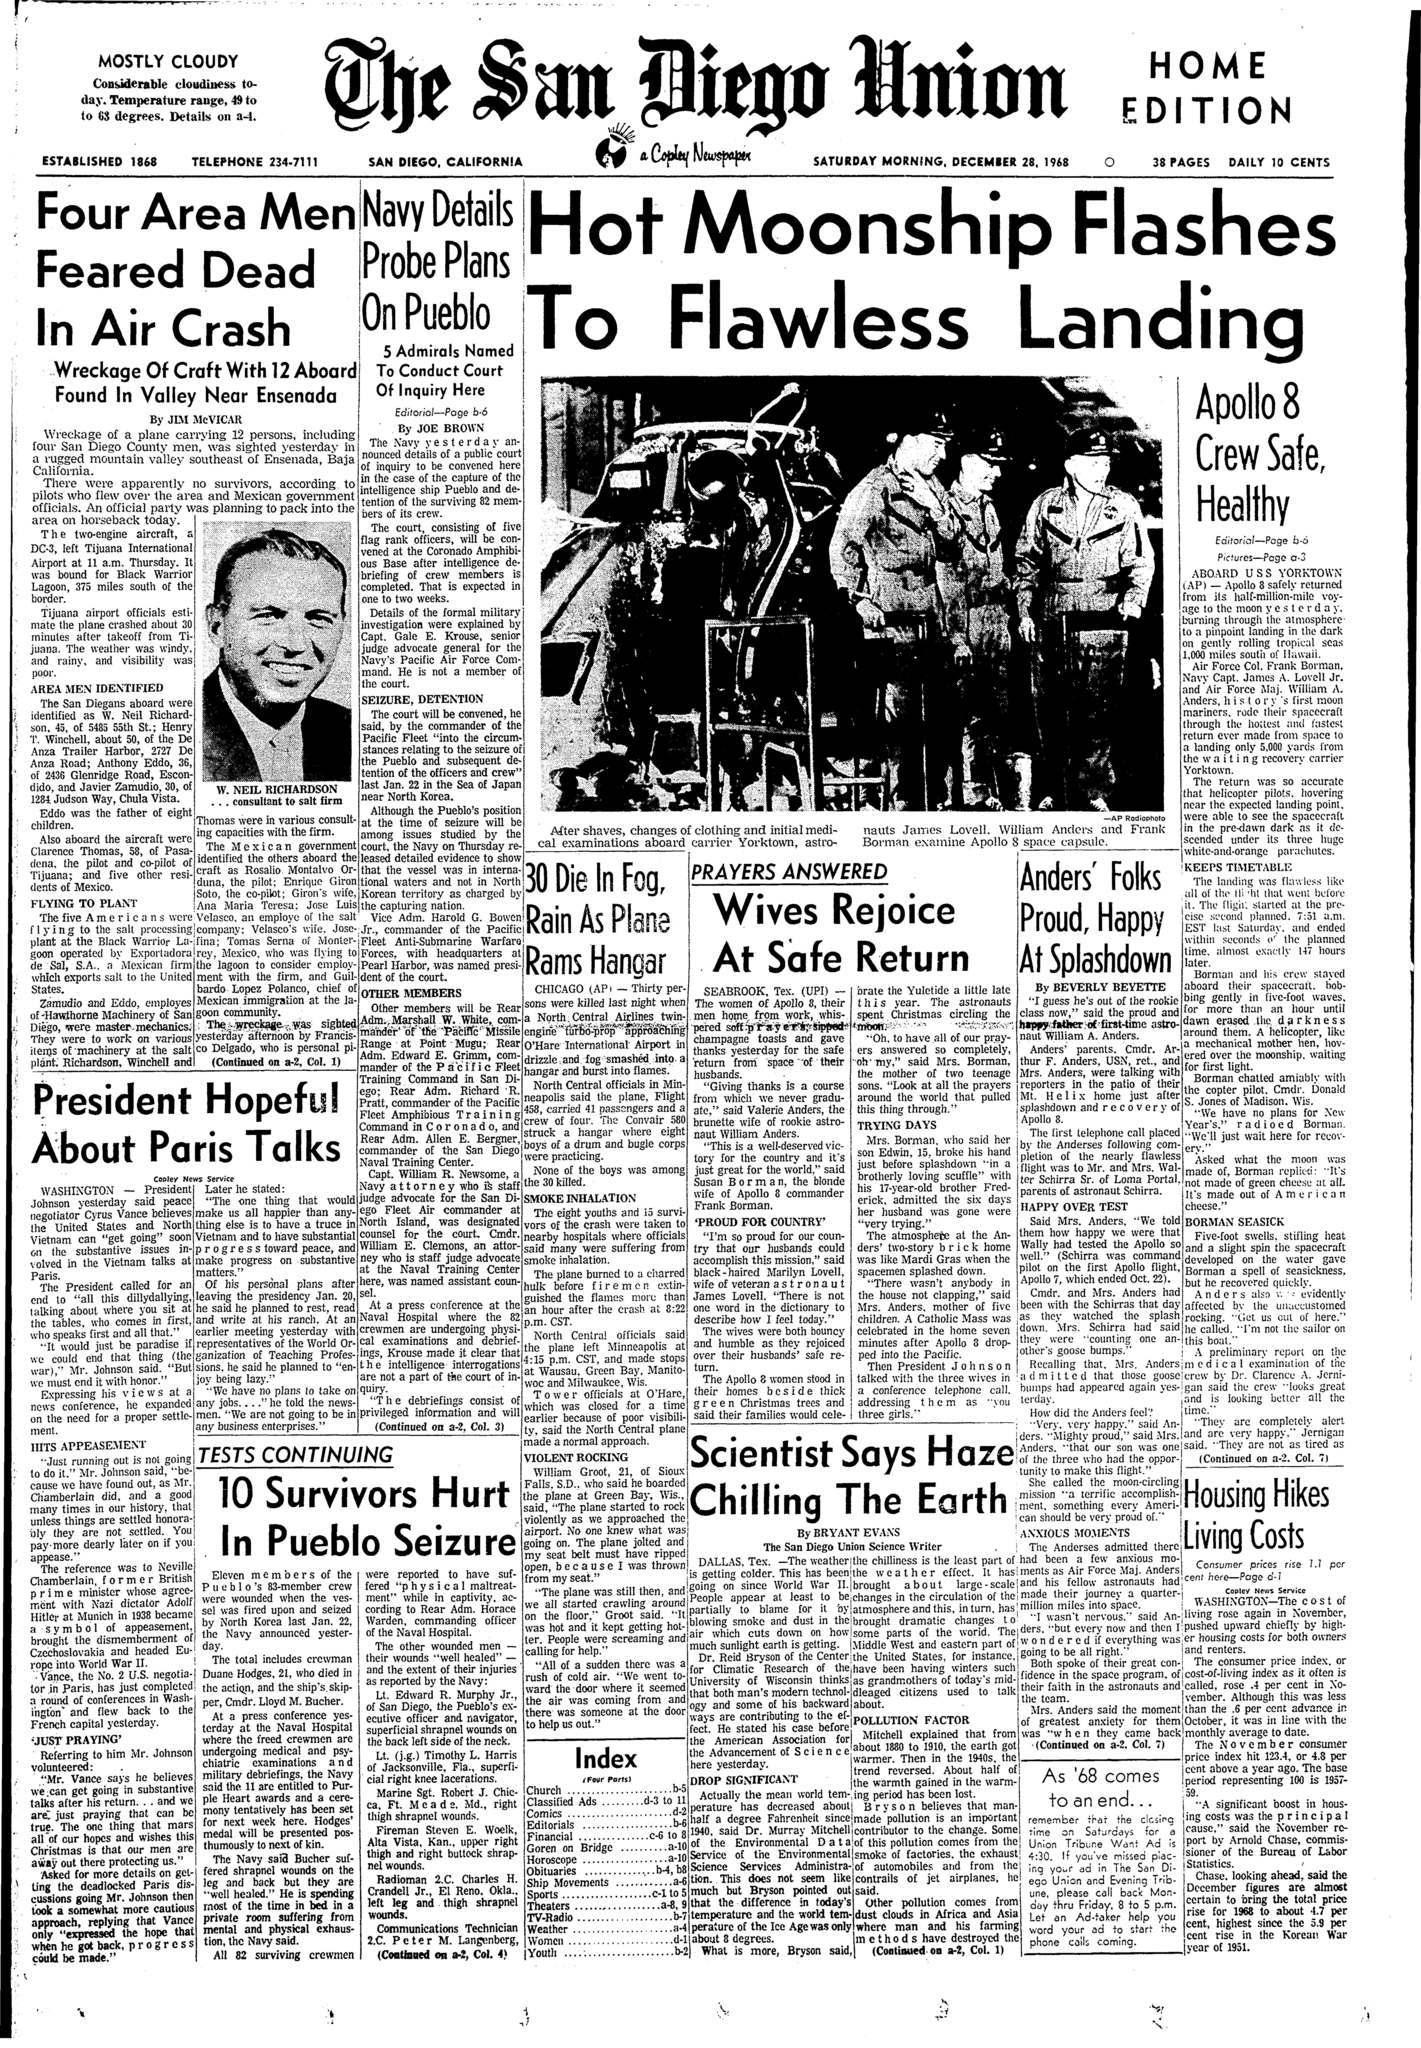 December 28, 1968